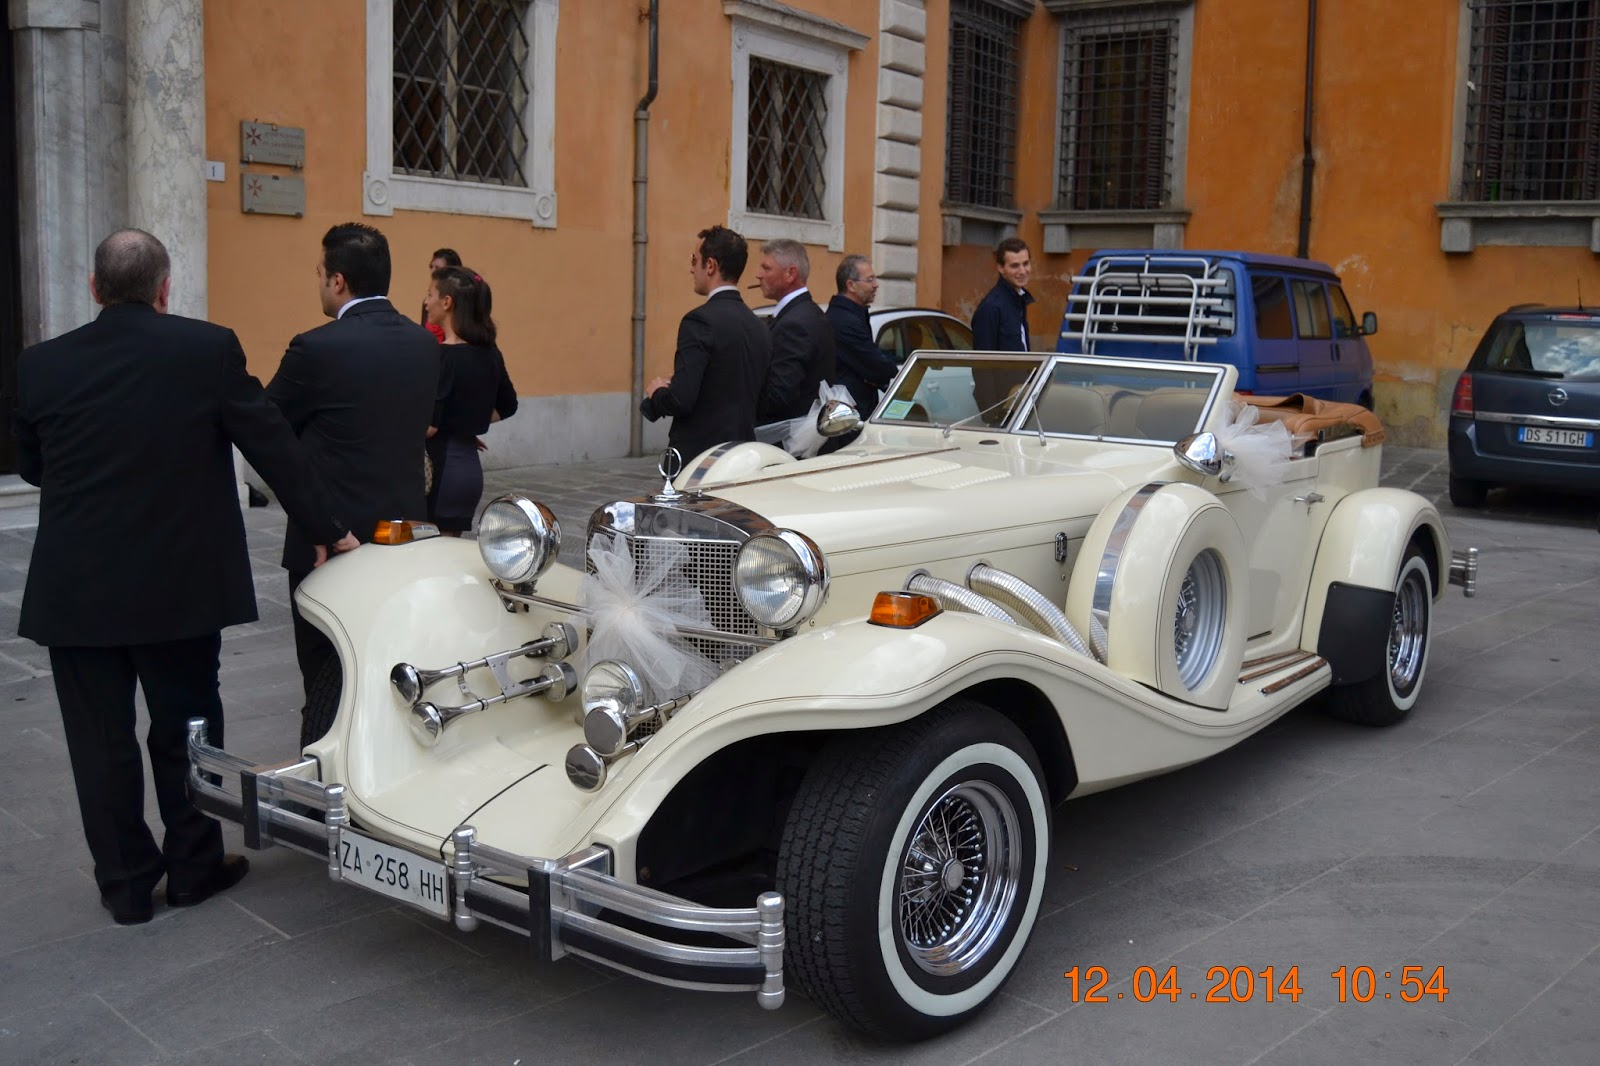 Beautiful Marriage @ Pisa